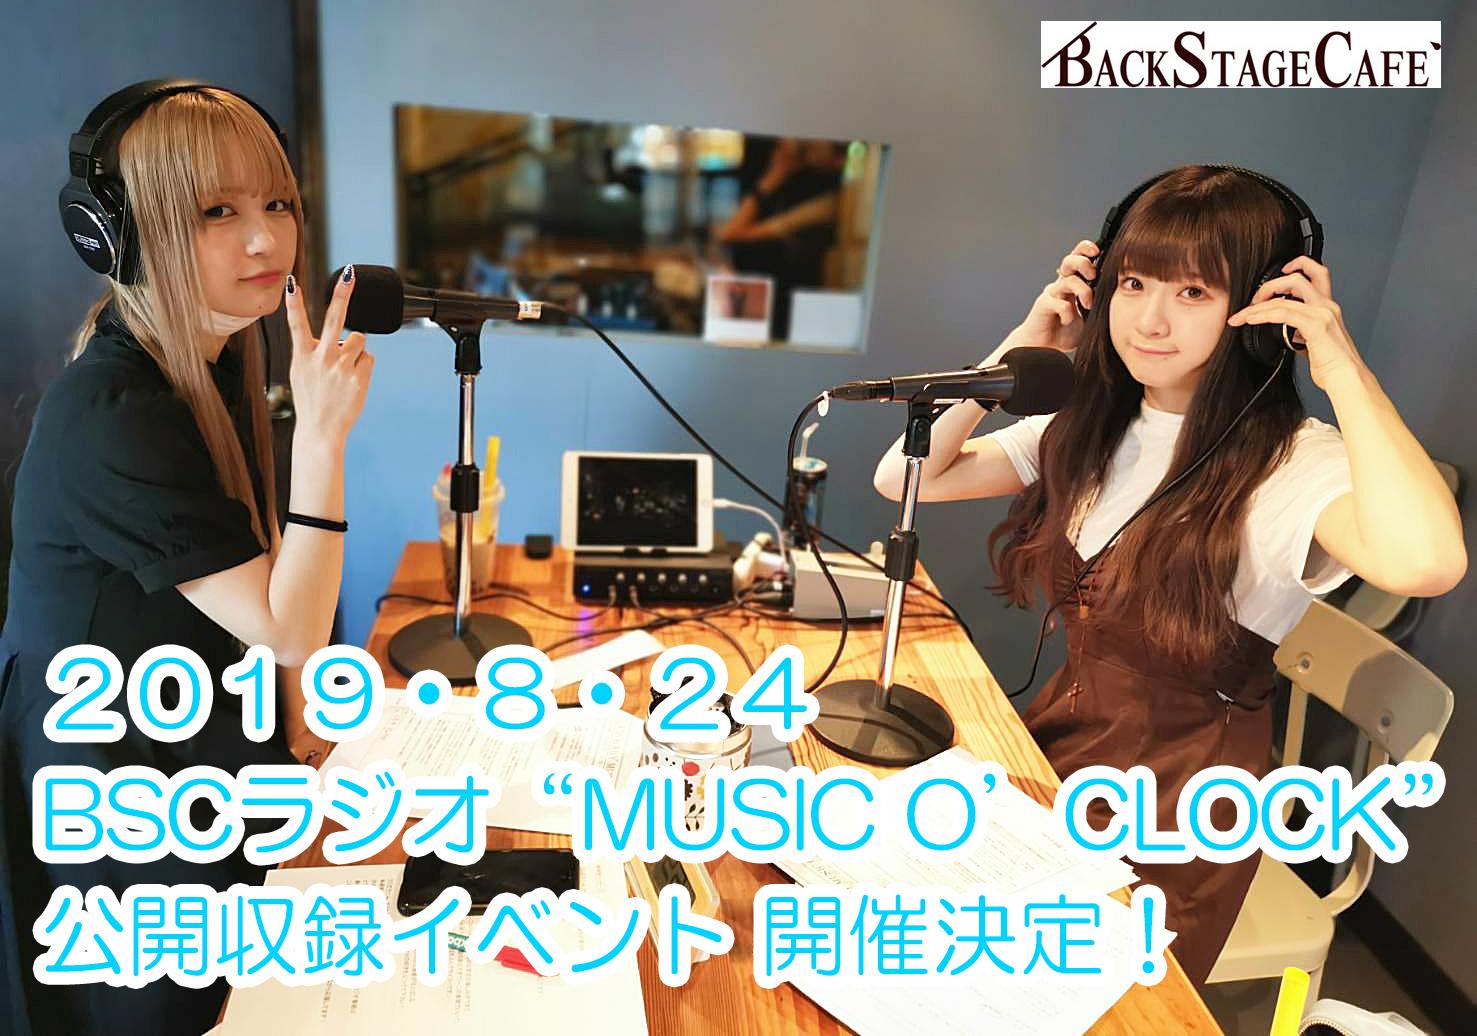 BSCラジオ LADYBABY MUSIC O'CLOCK公開収録[一部][ニ部]